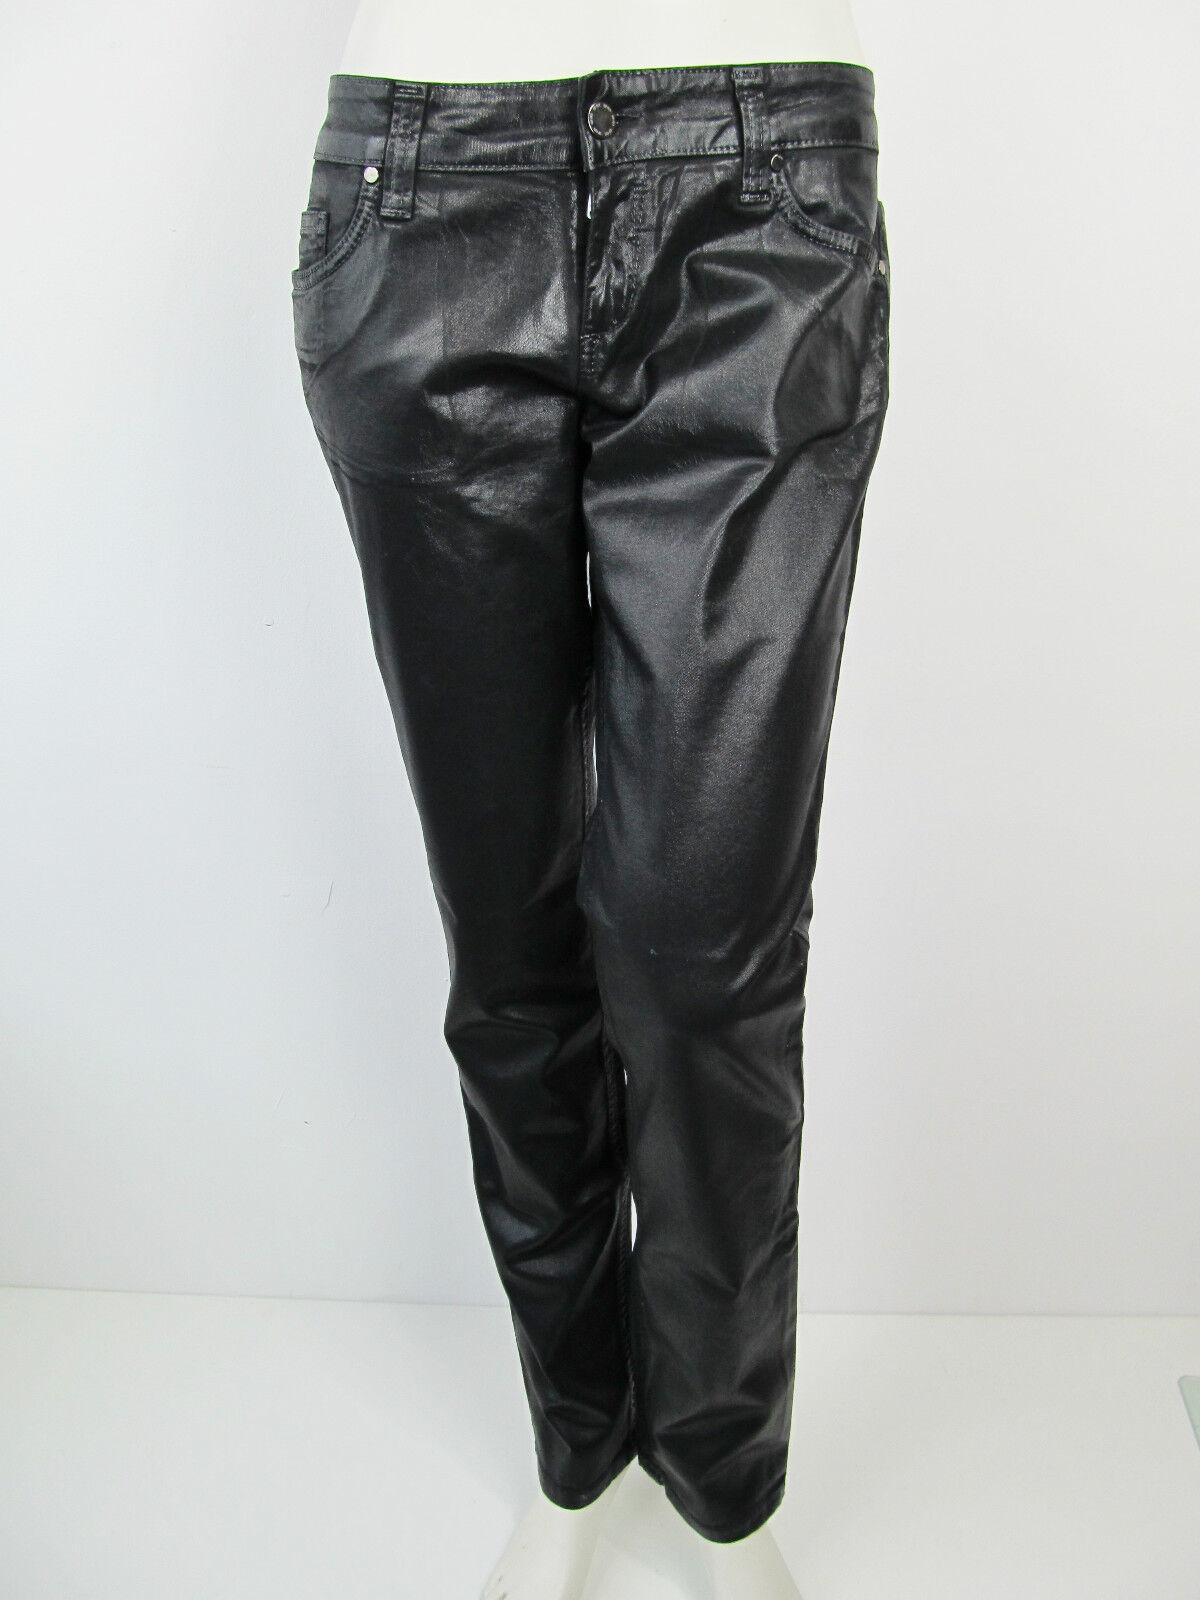 Liu.Jo Hose Jeans Magic Slim Leg Röhren Hose black Gr 32